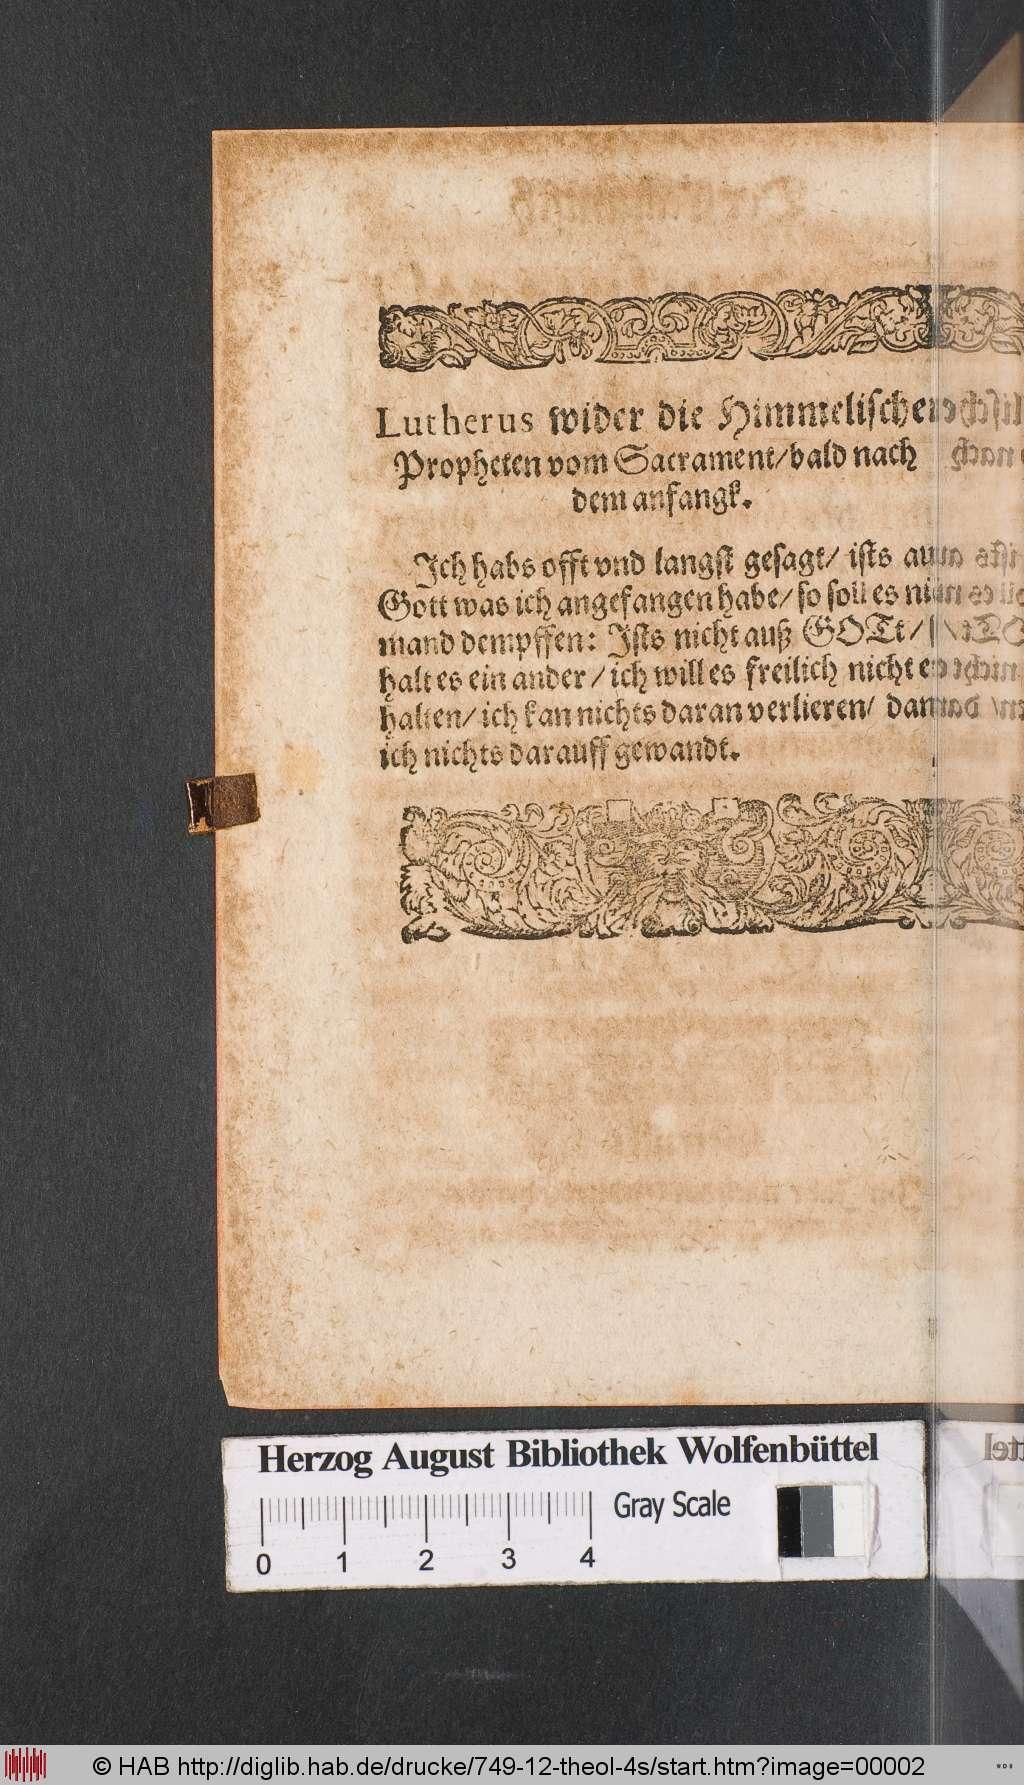 http://diglib.hab.de/drucke/749-12-theol-4s/00002.jpg